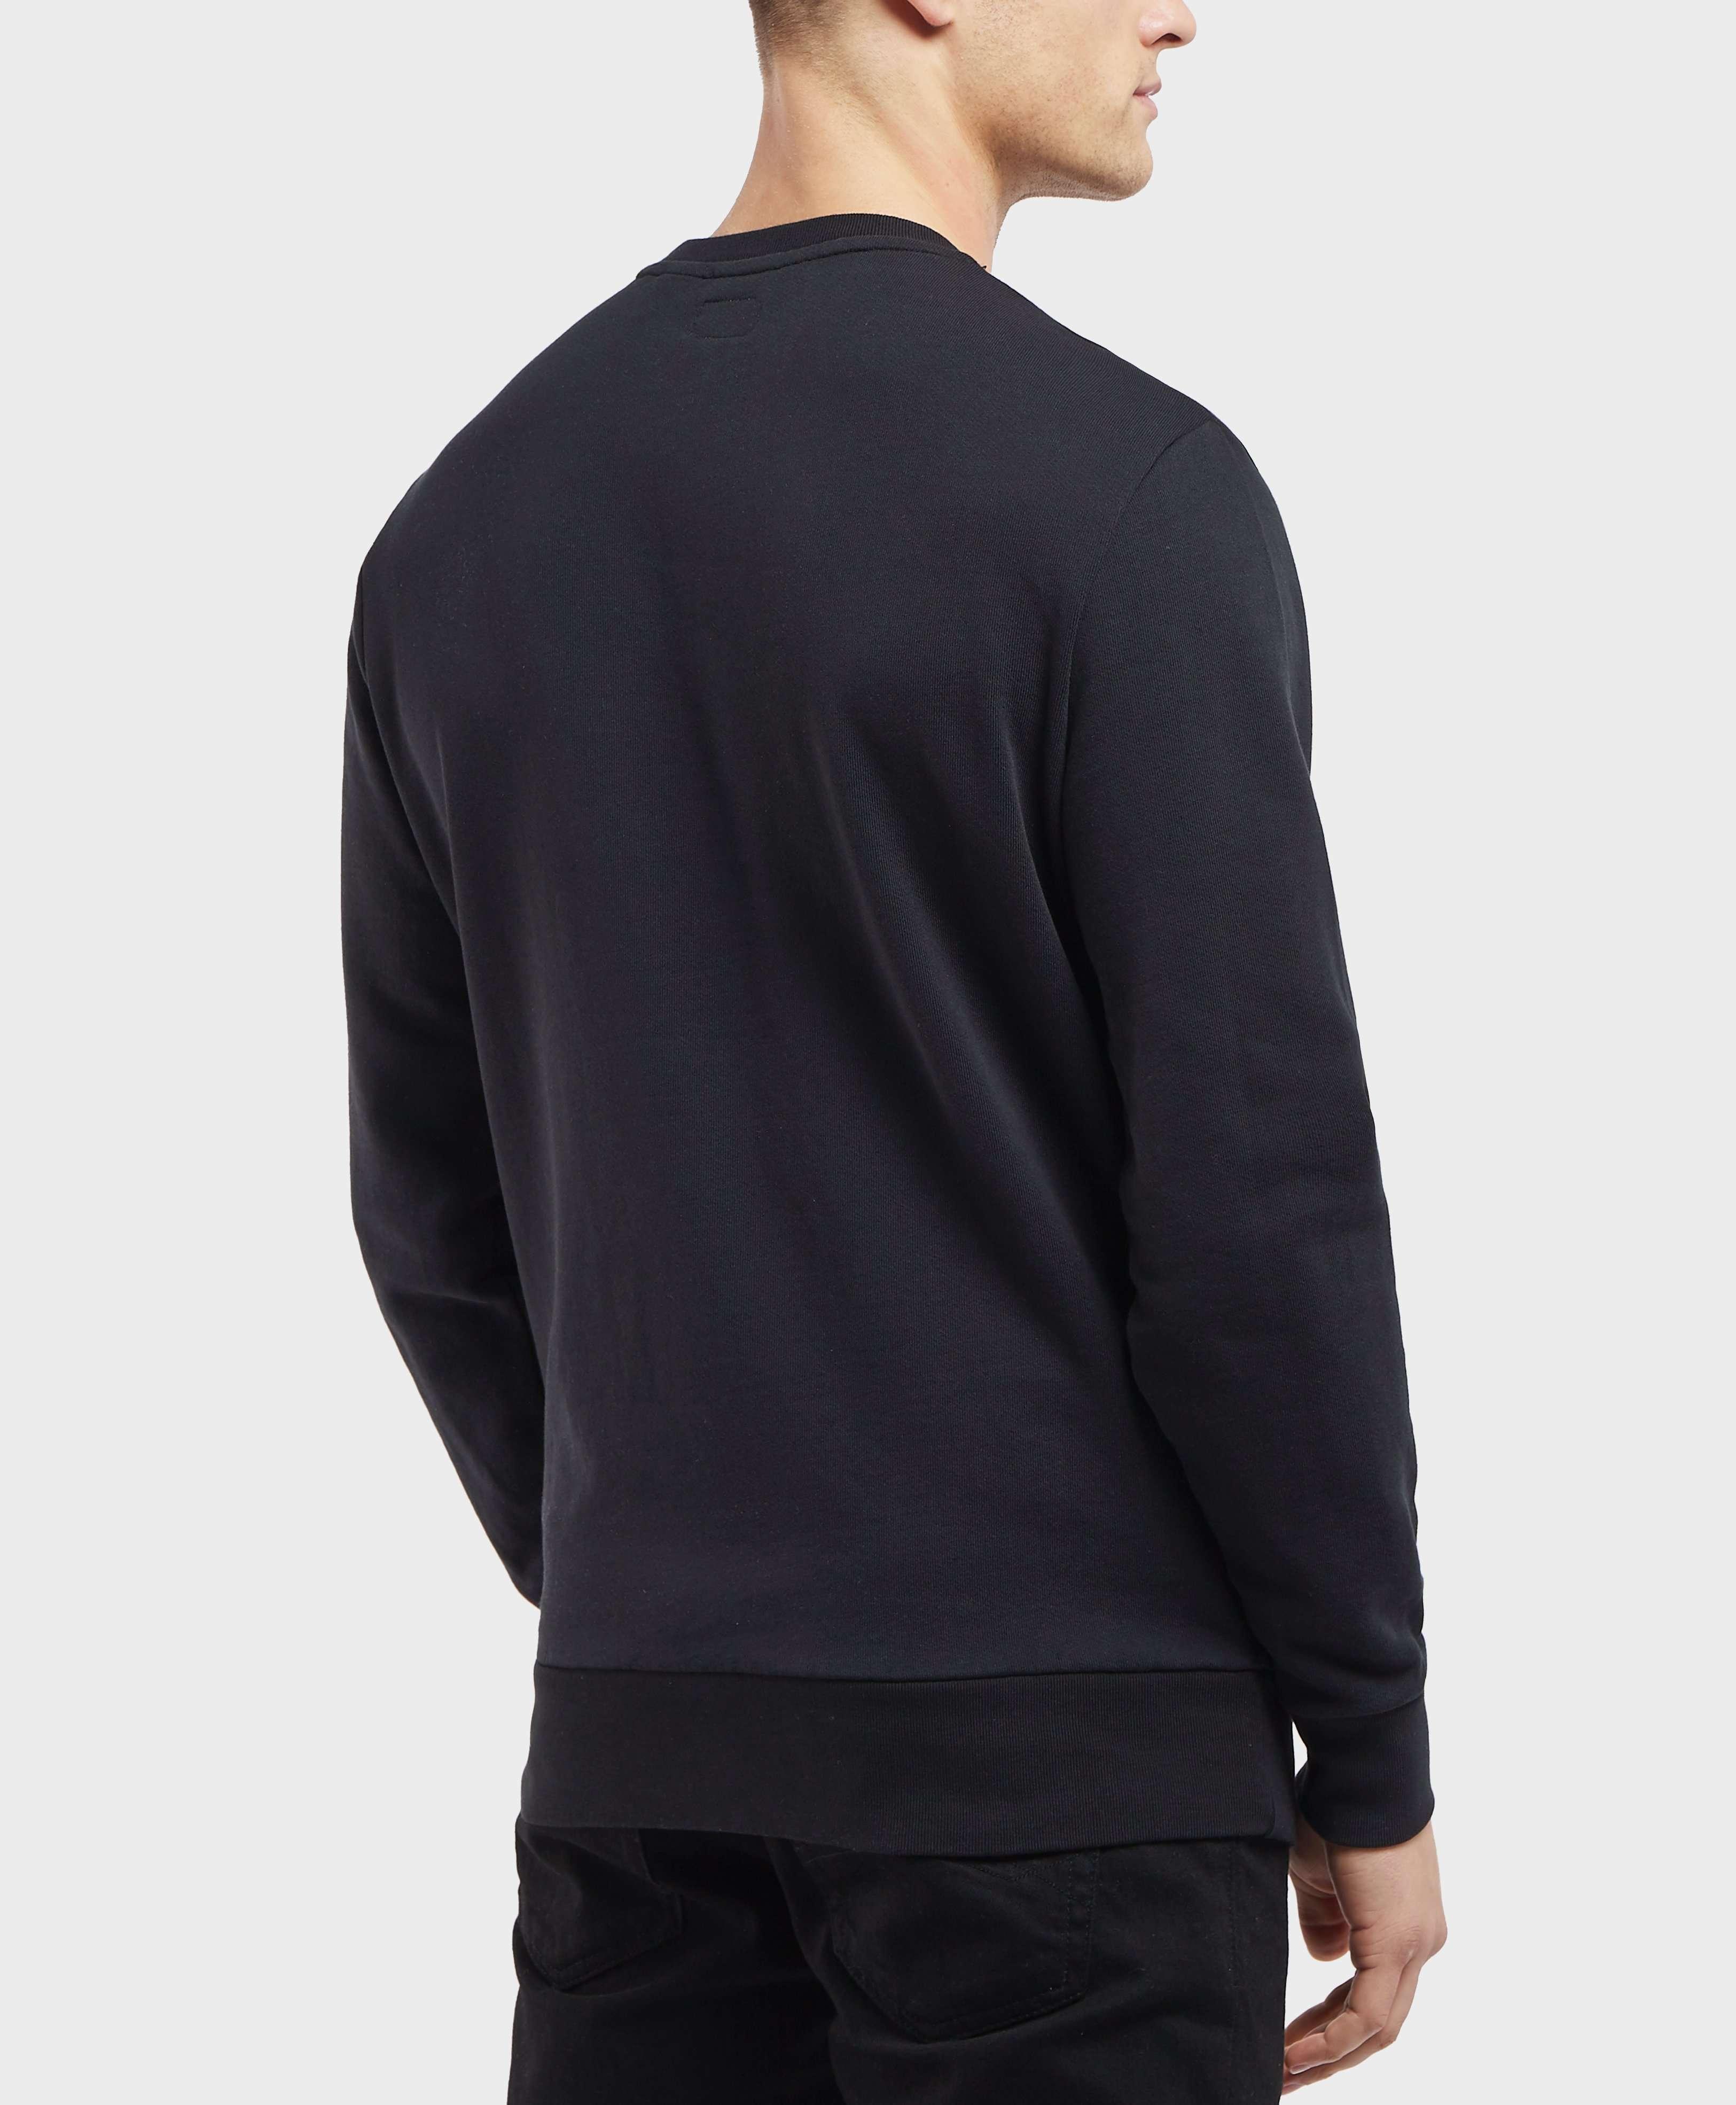 Levis Camo Batwing Logo Sweatshirt